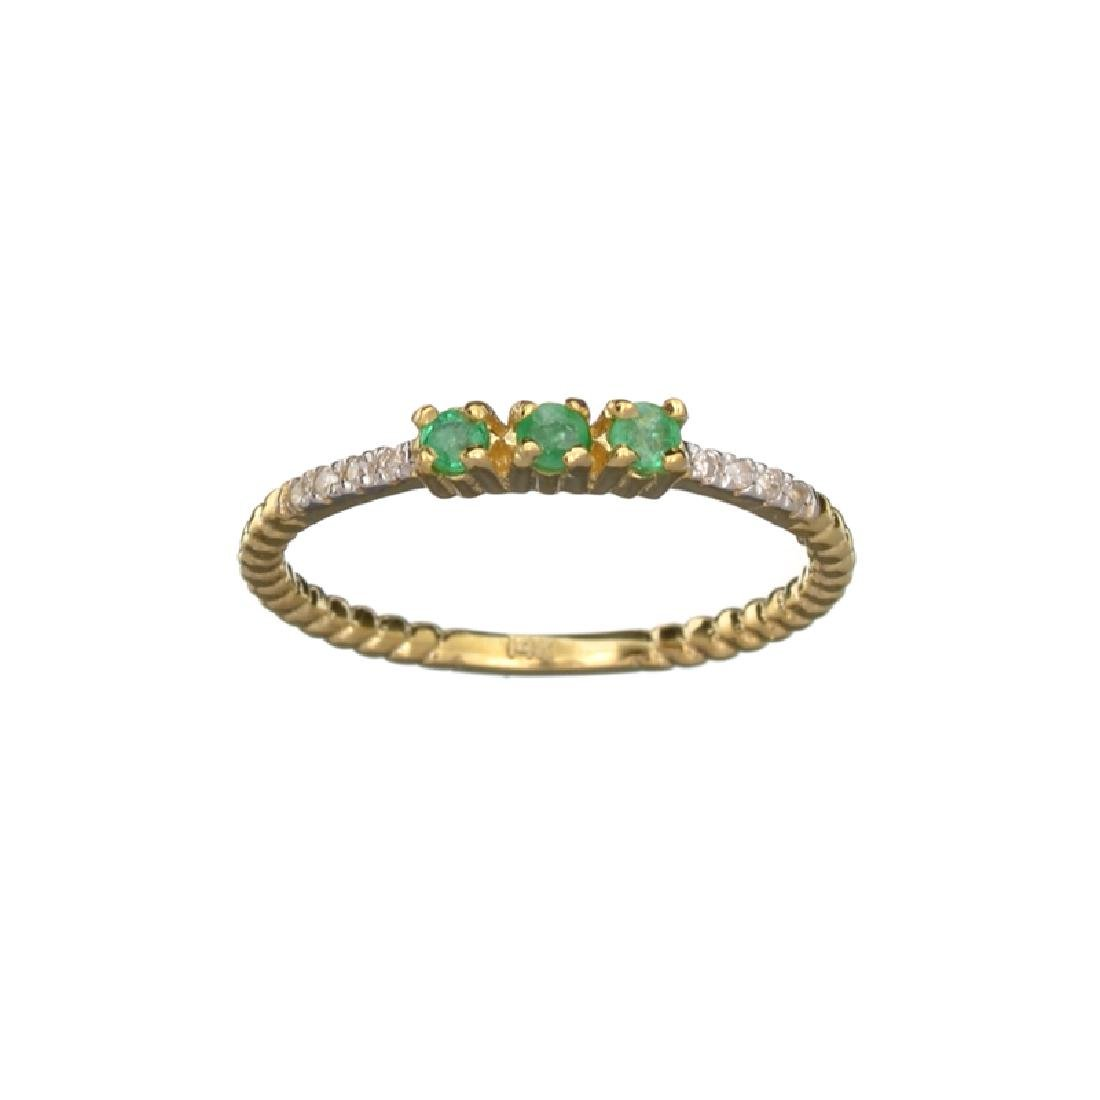 APP: 0.6k Fine Jewelry 14 KT Gold, 0.18CT Green Emerald